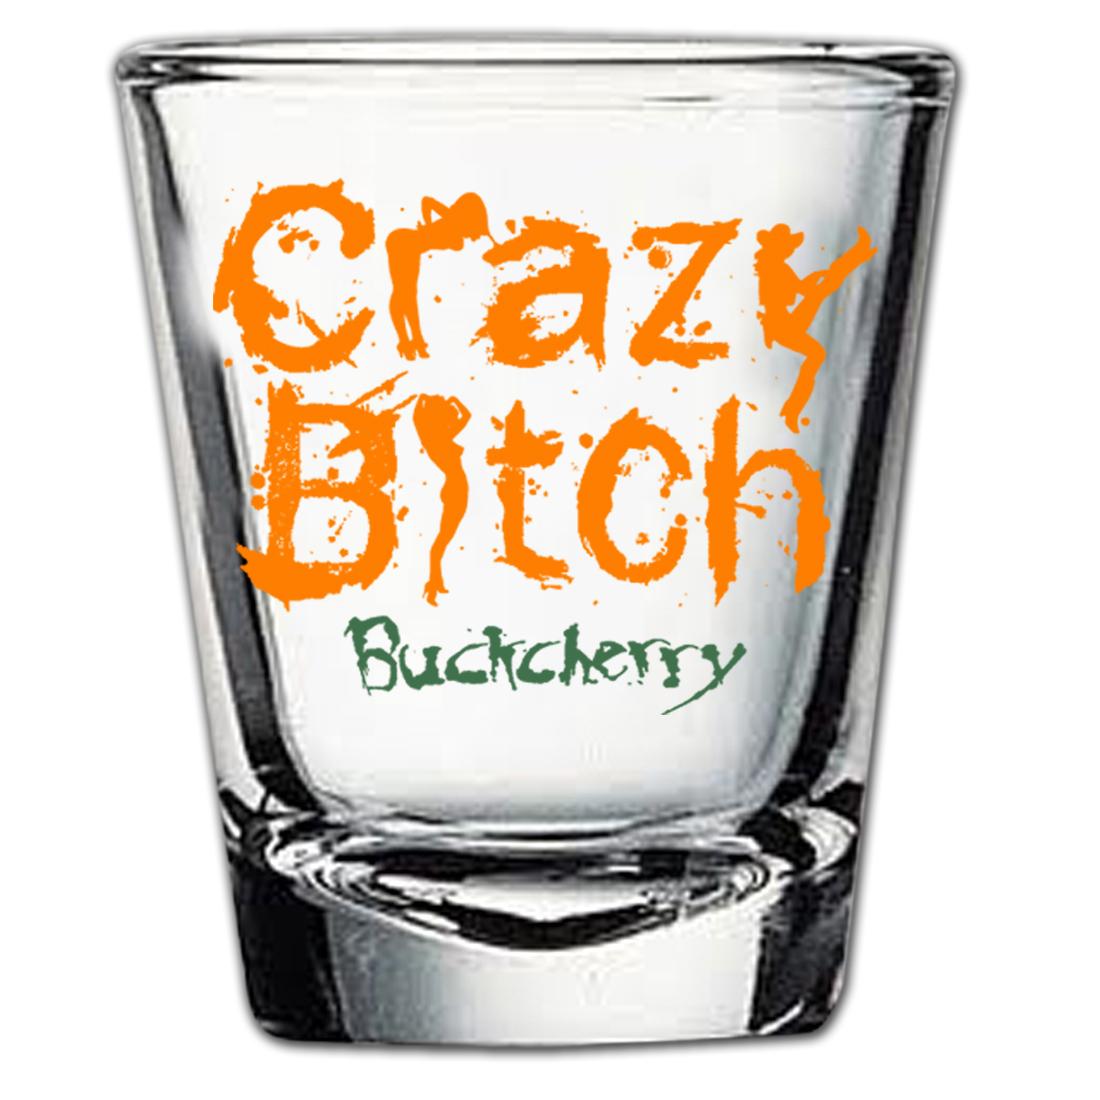 Buckcherry - Crazy Bith Video - YouTube